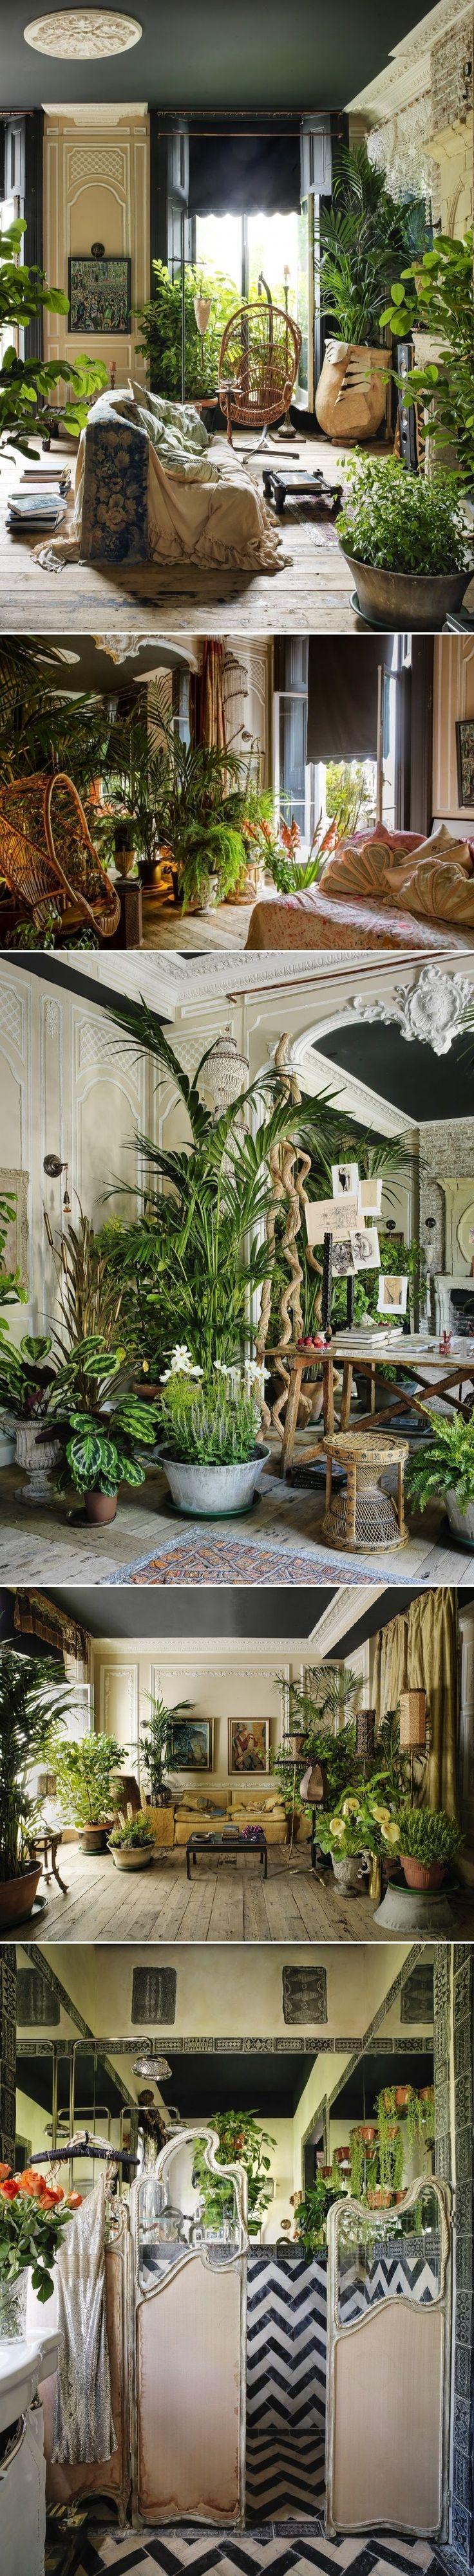 Interior designer Sera Hersham-Loftus's bohemian, plant-filled home in Little Venice, London, UK More